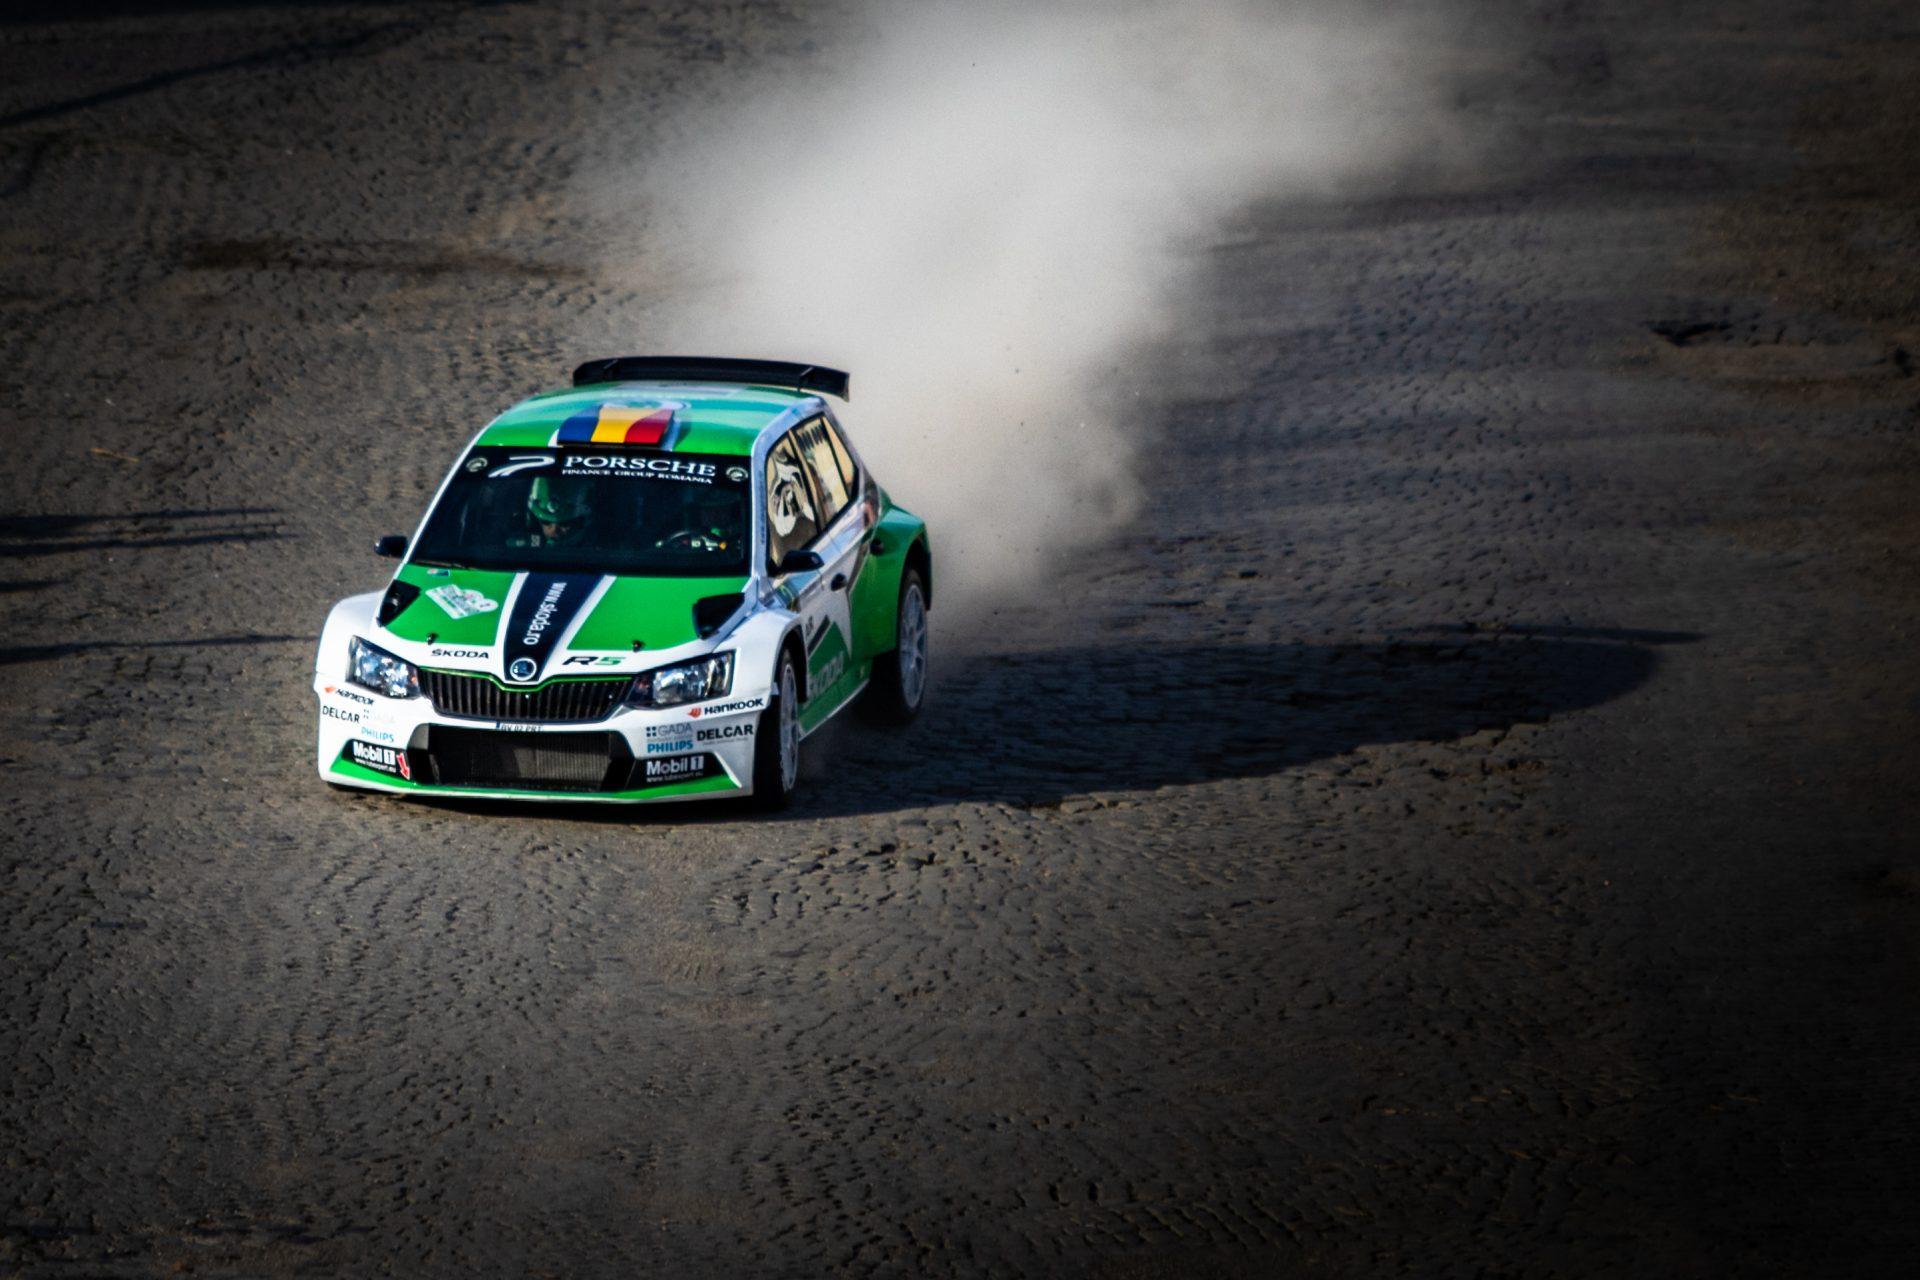 Best of Harghita Rally 2017 by Attila Szabo